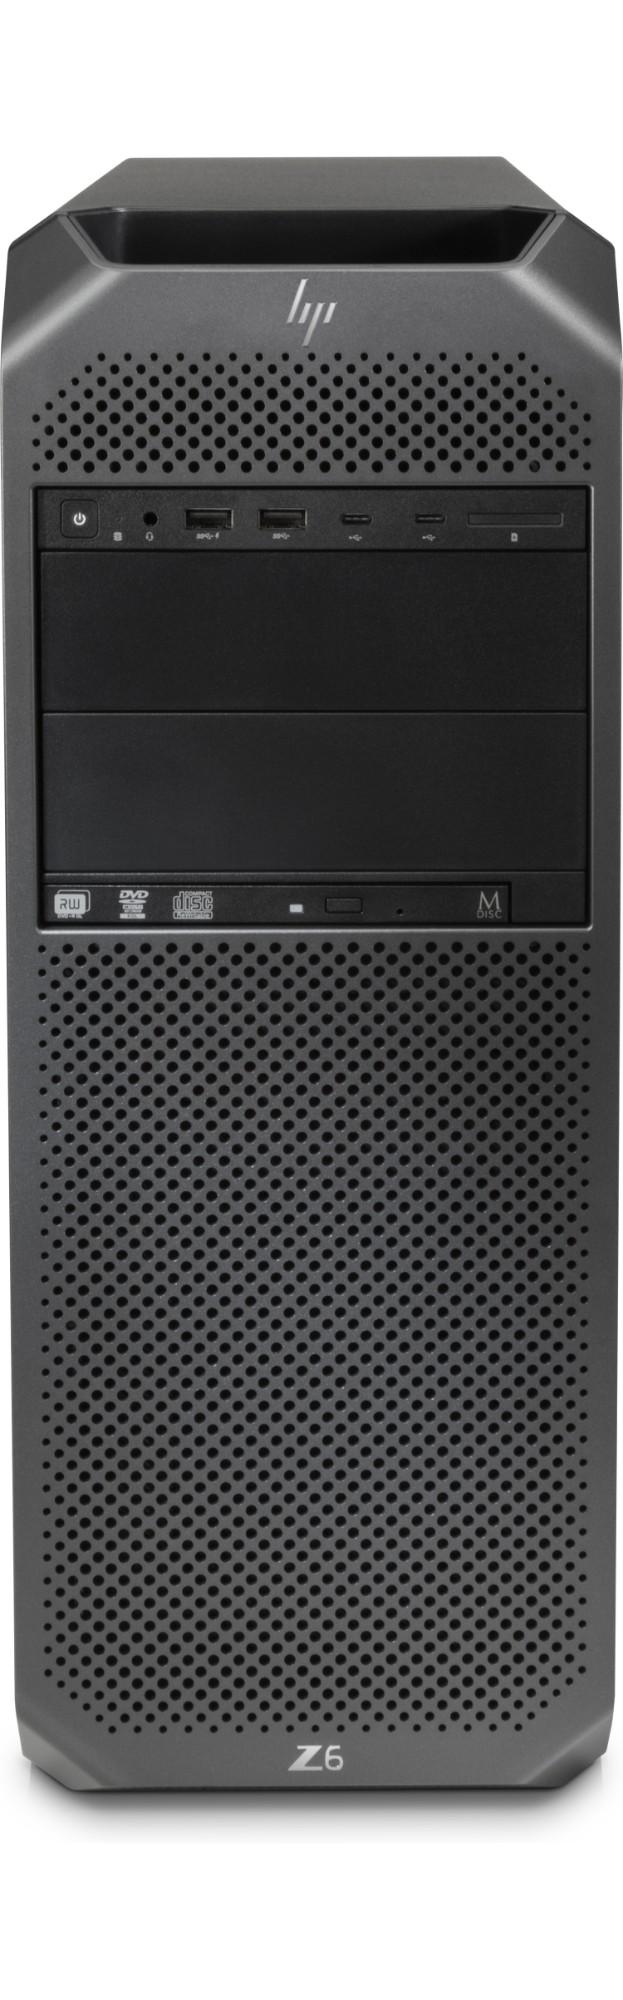 Workstation Z6 - 4108 - 32GB RAM - 1TB HDD - Win10 Pro - Qwerty UK